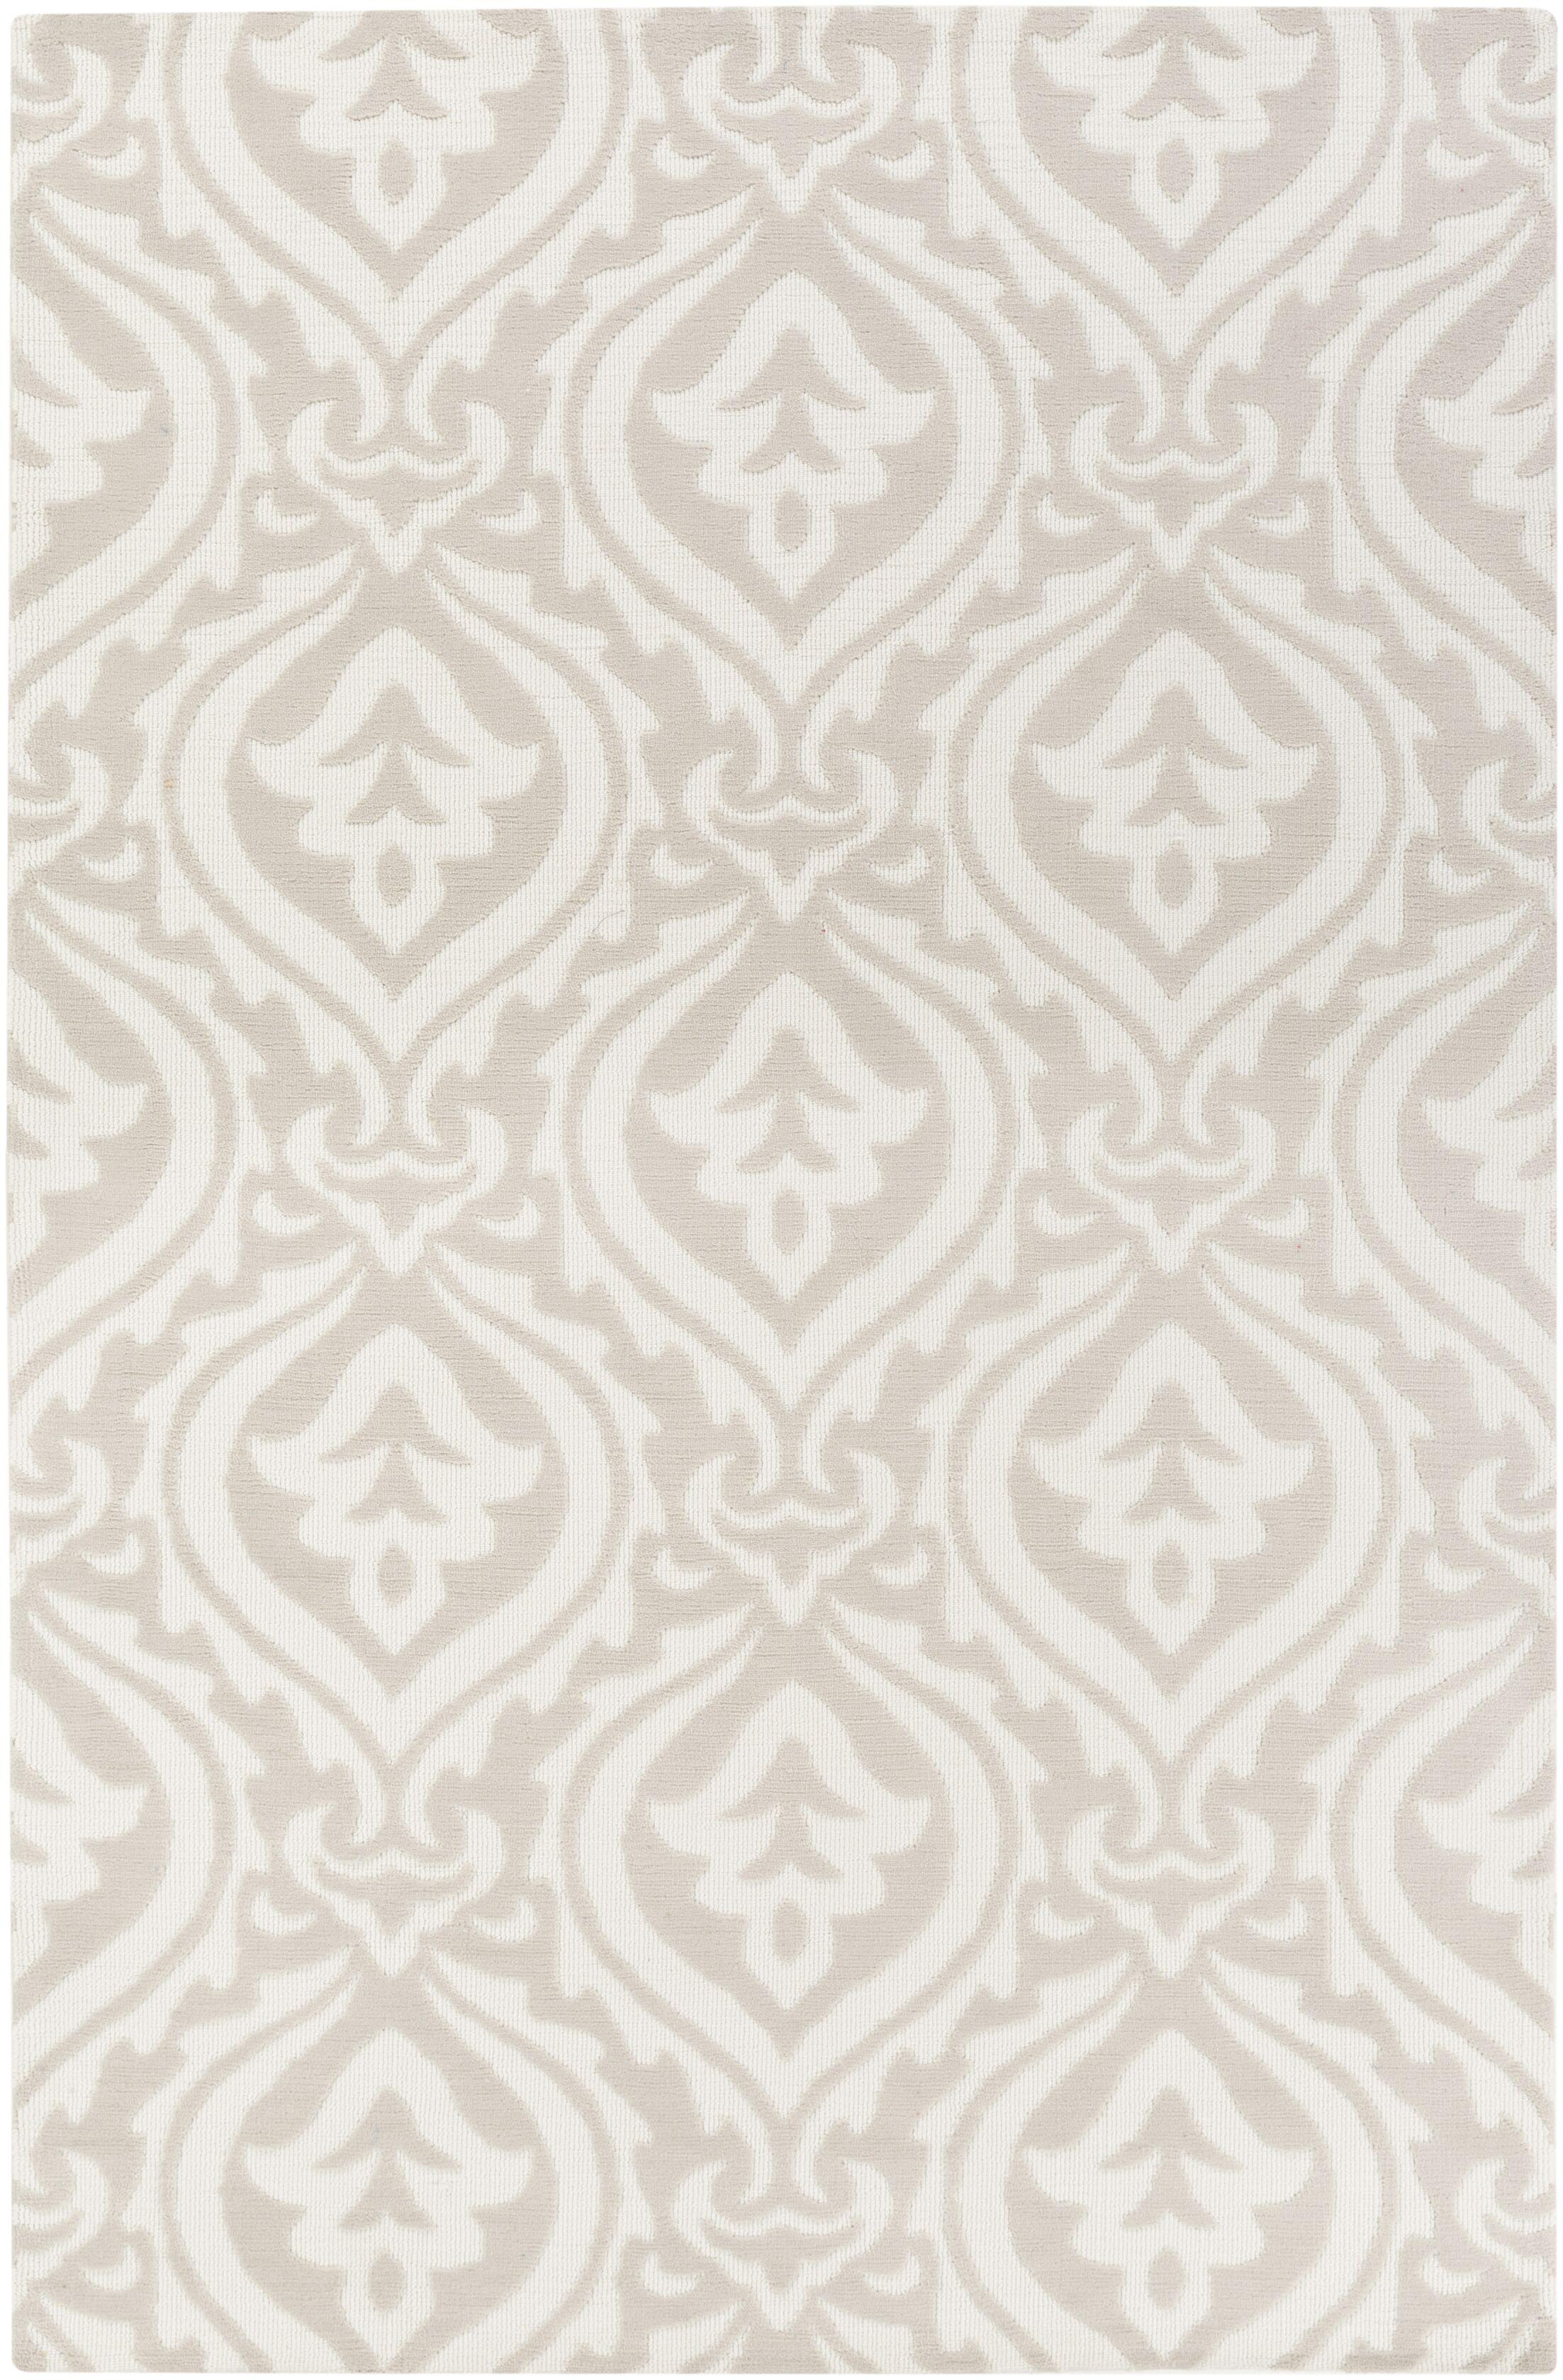 Lachapelle Ivory/Beige Area Rug Rug Size: Rectangle 7'6